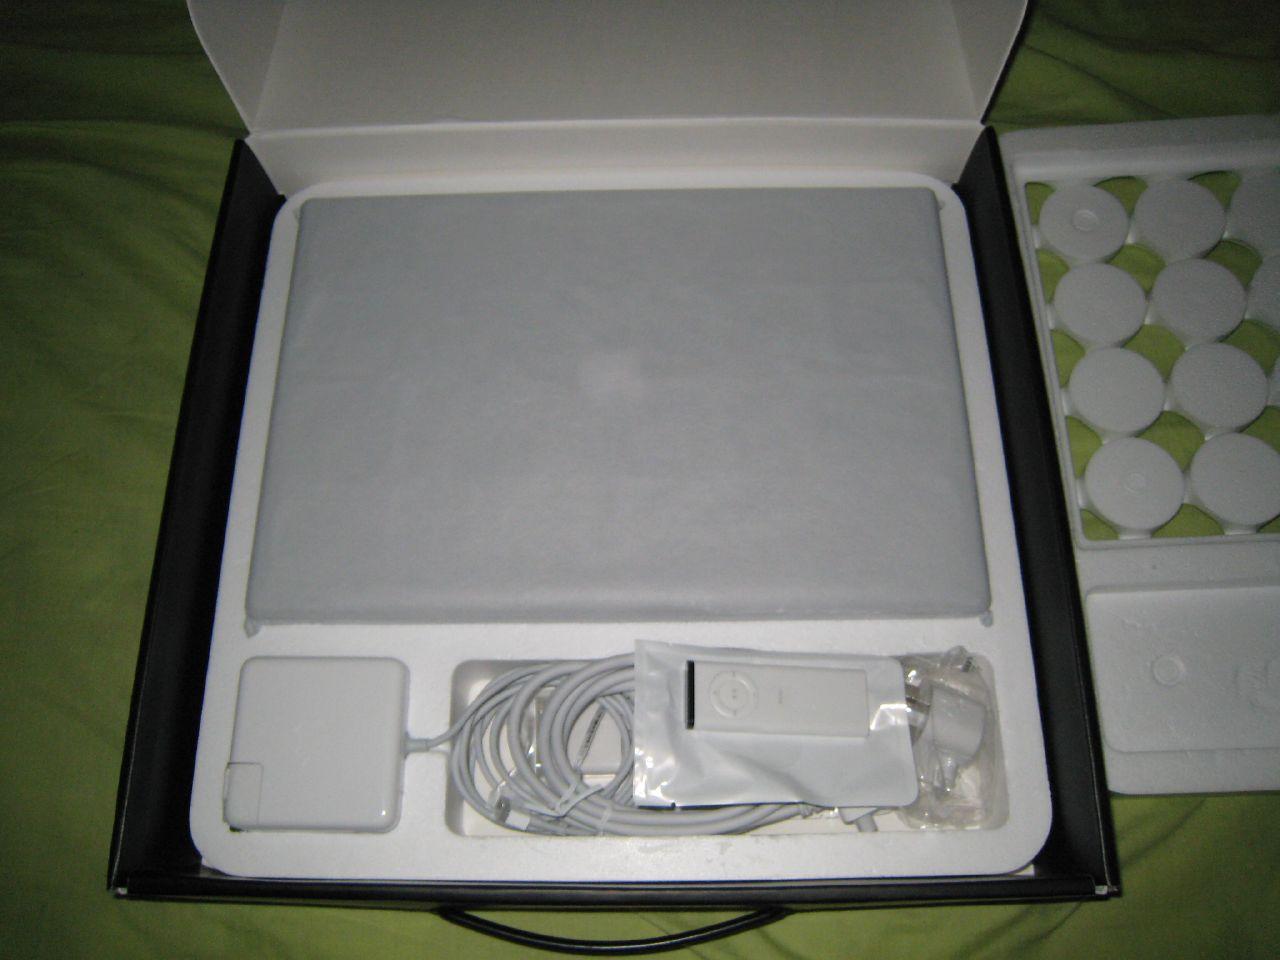 macbook pro open box